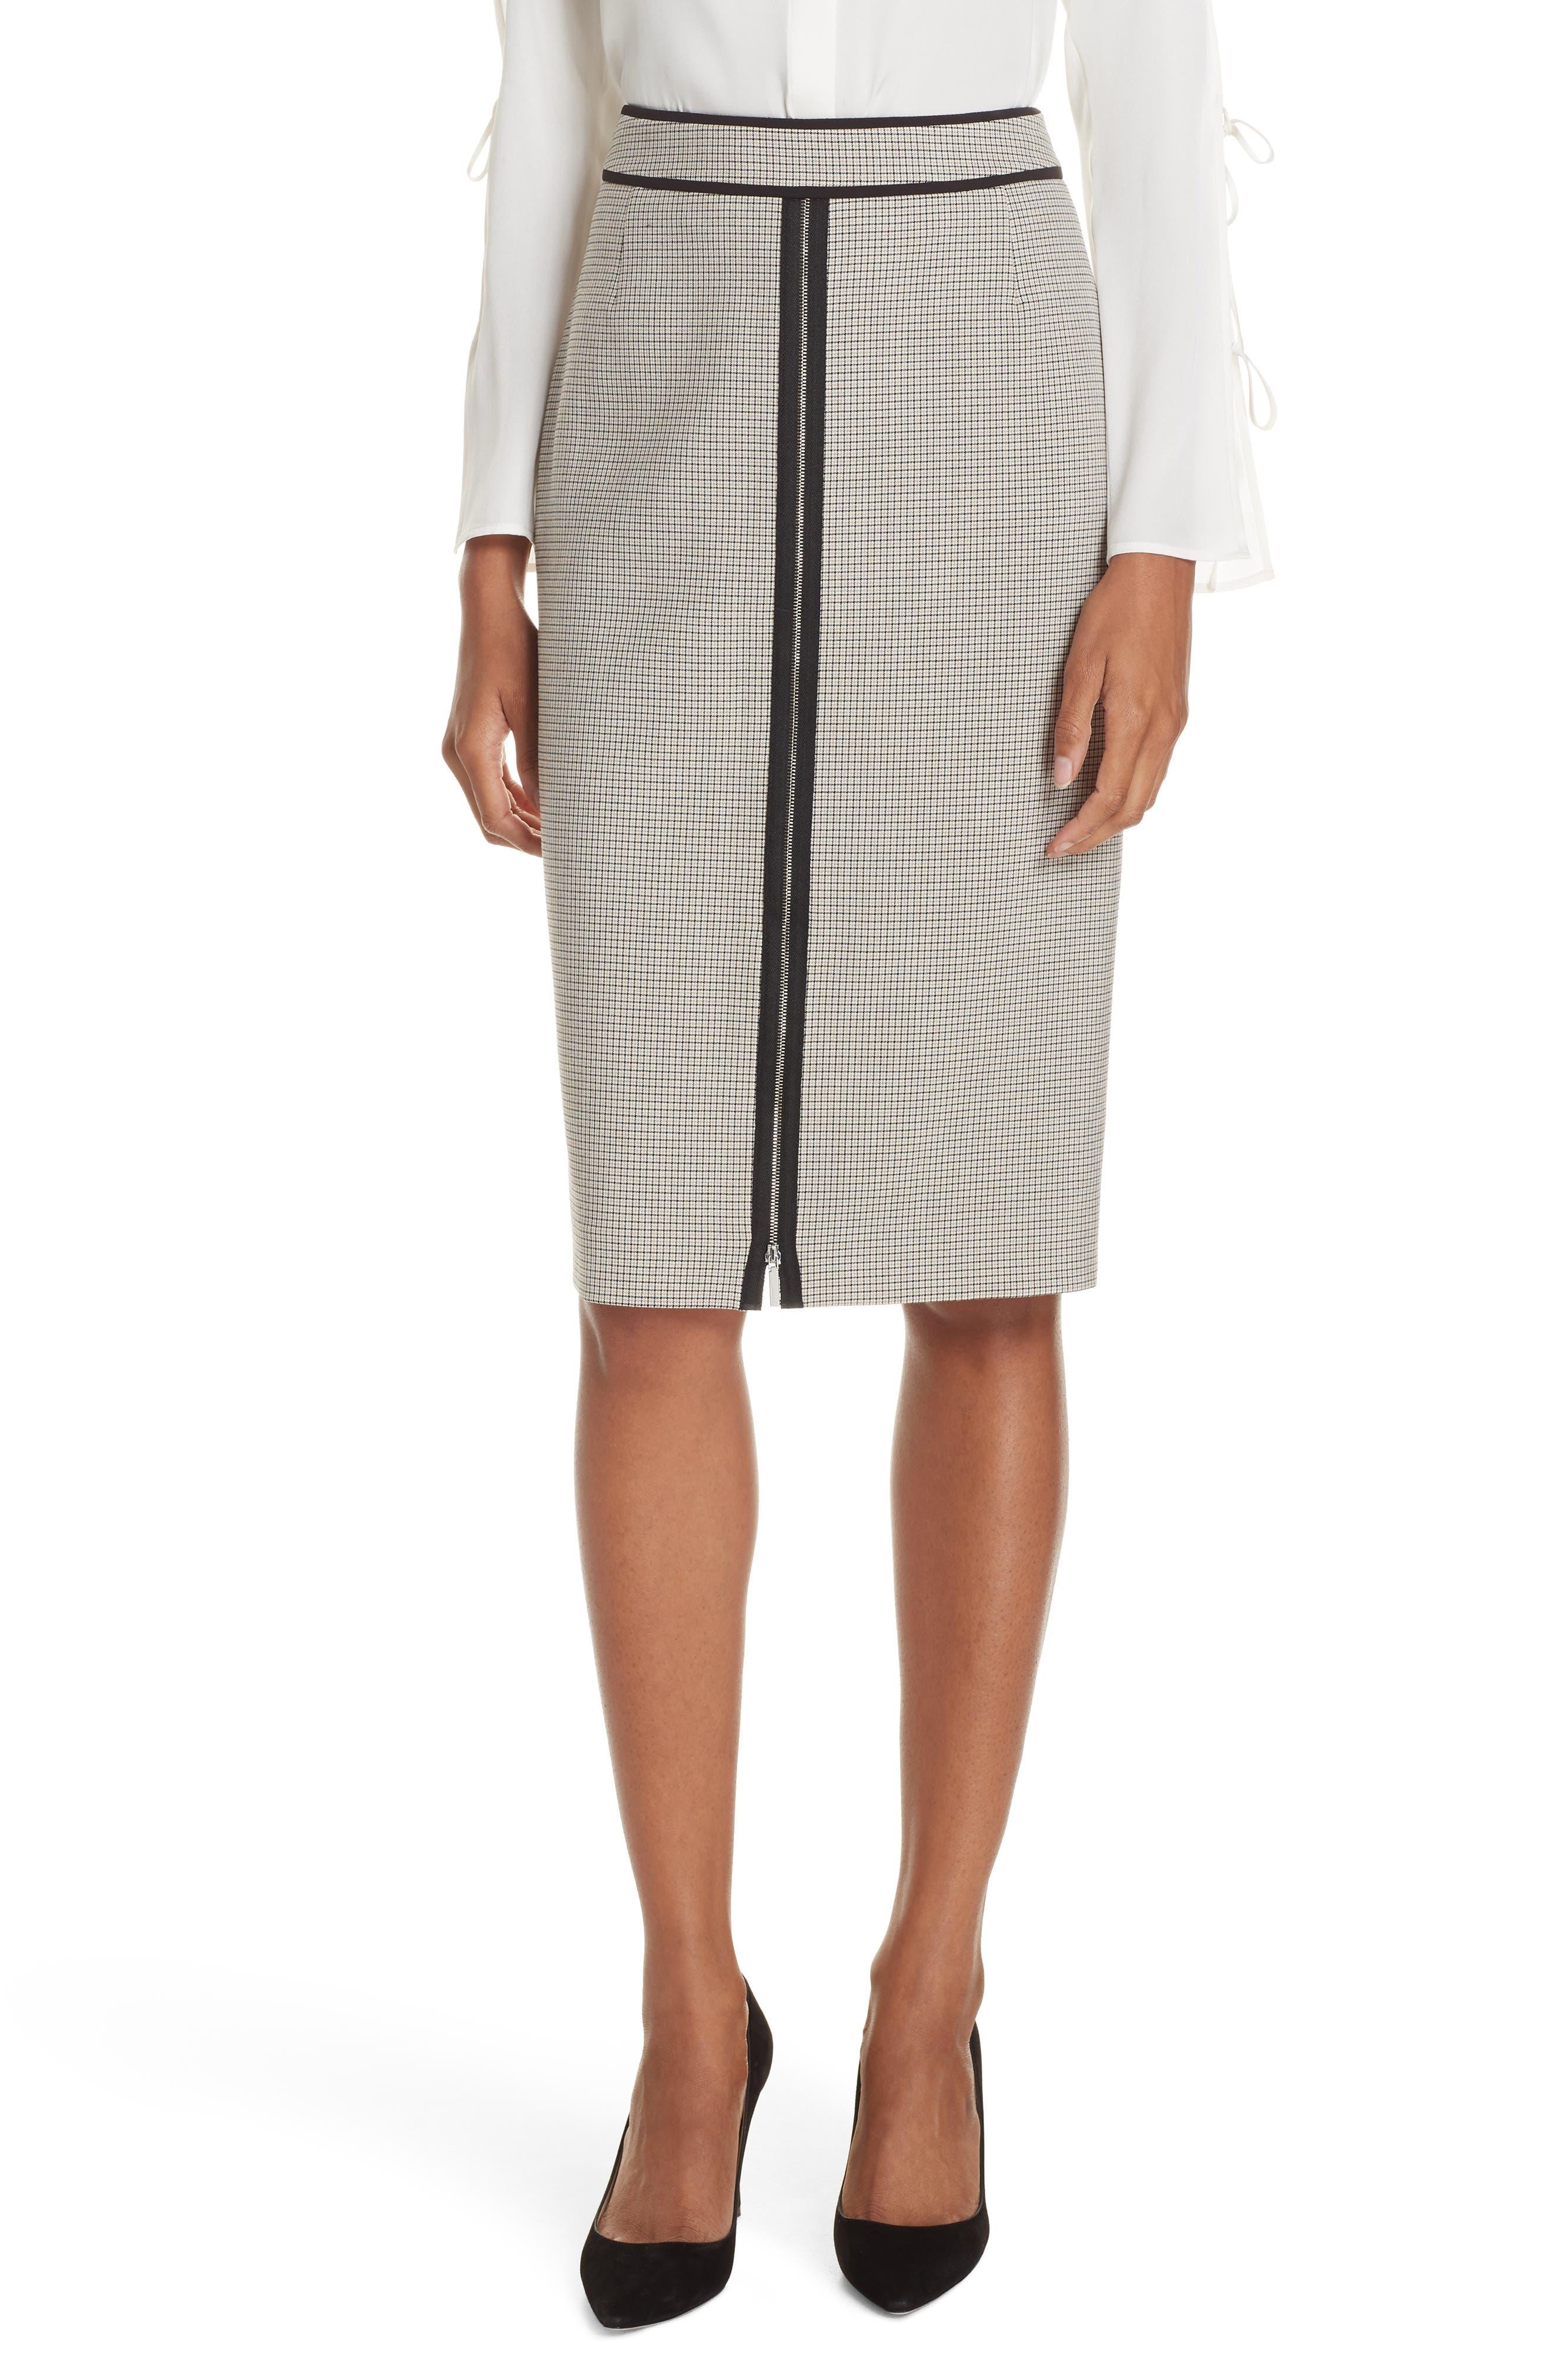 Voliviena Pencil Skirt,                             Main thumbnail 1, color,                             STONE FANTASTY